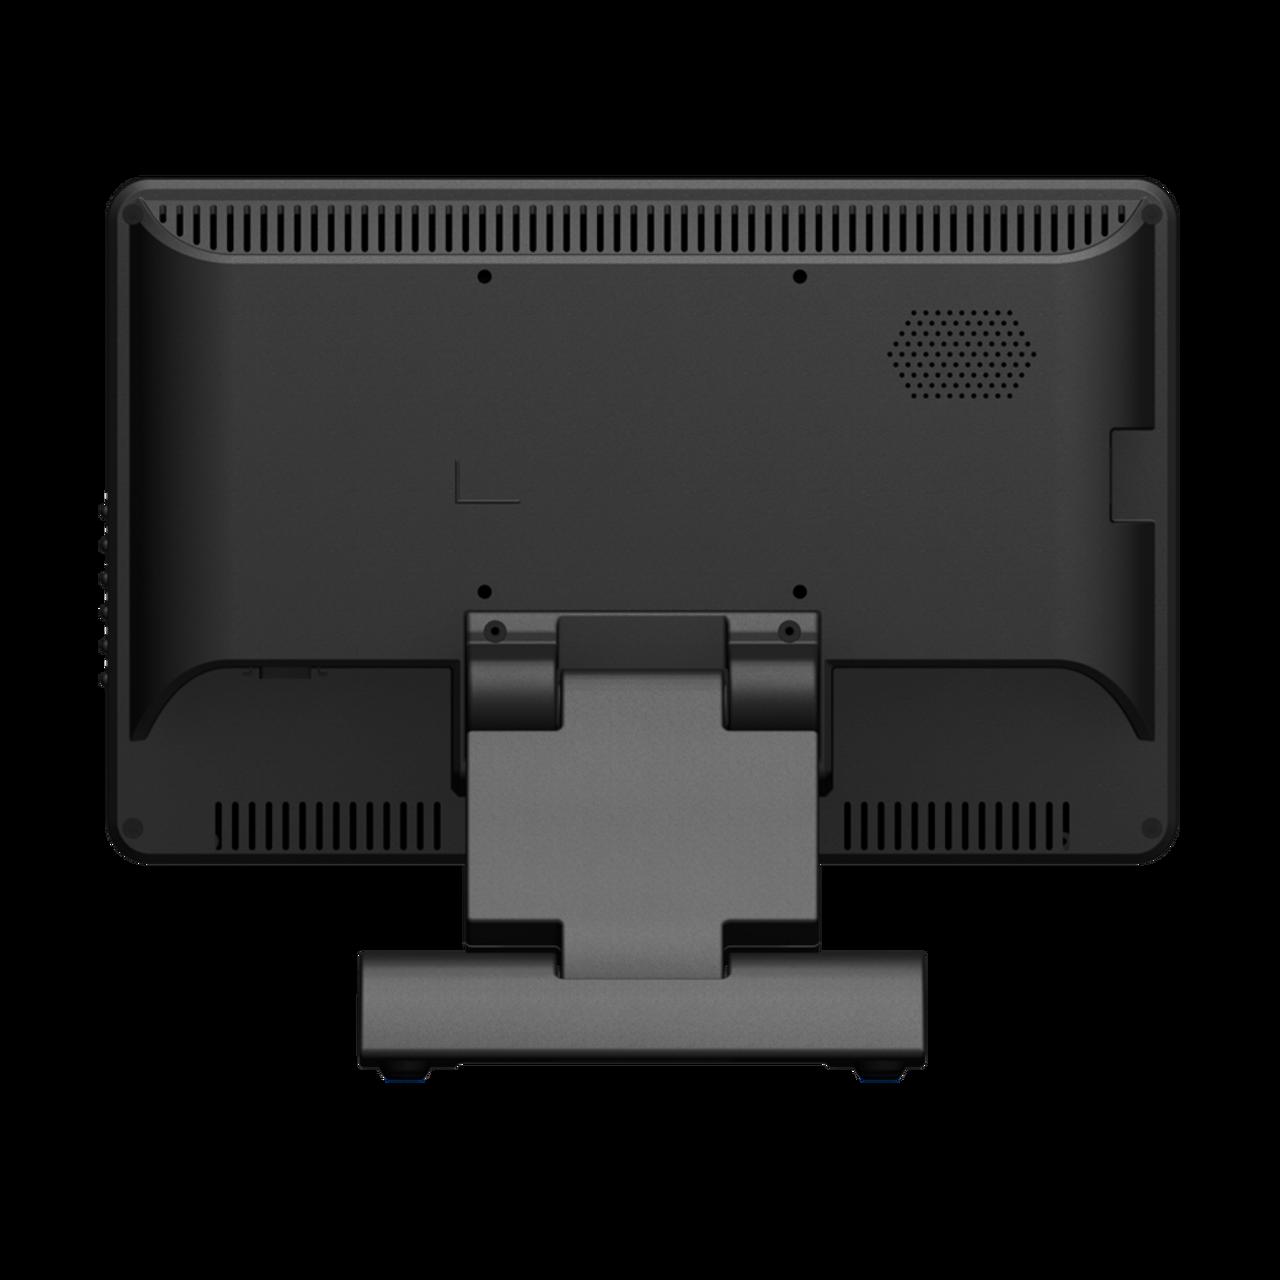 FA1011-NP/C (Non-Touch) 10.1 inch monitor